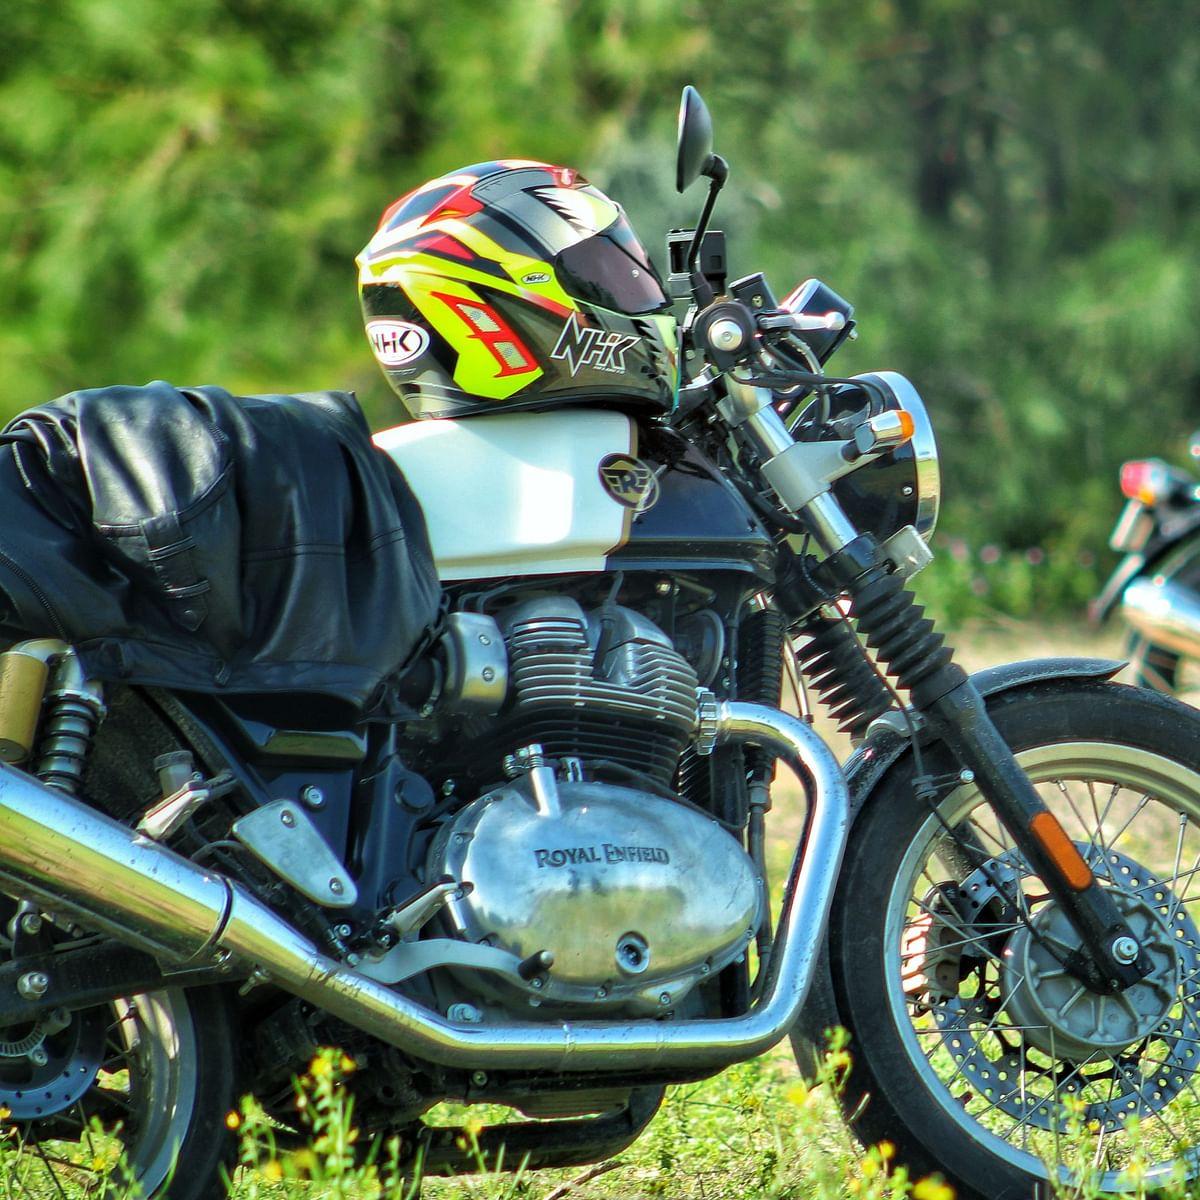 How to Choose a Motorcycle Helmet